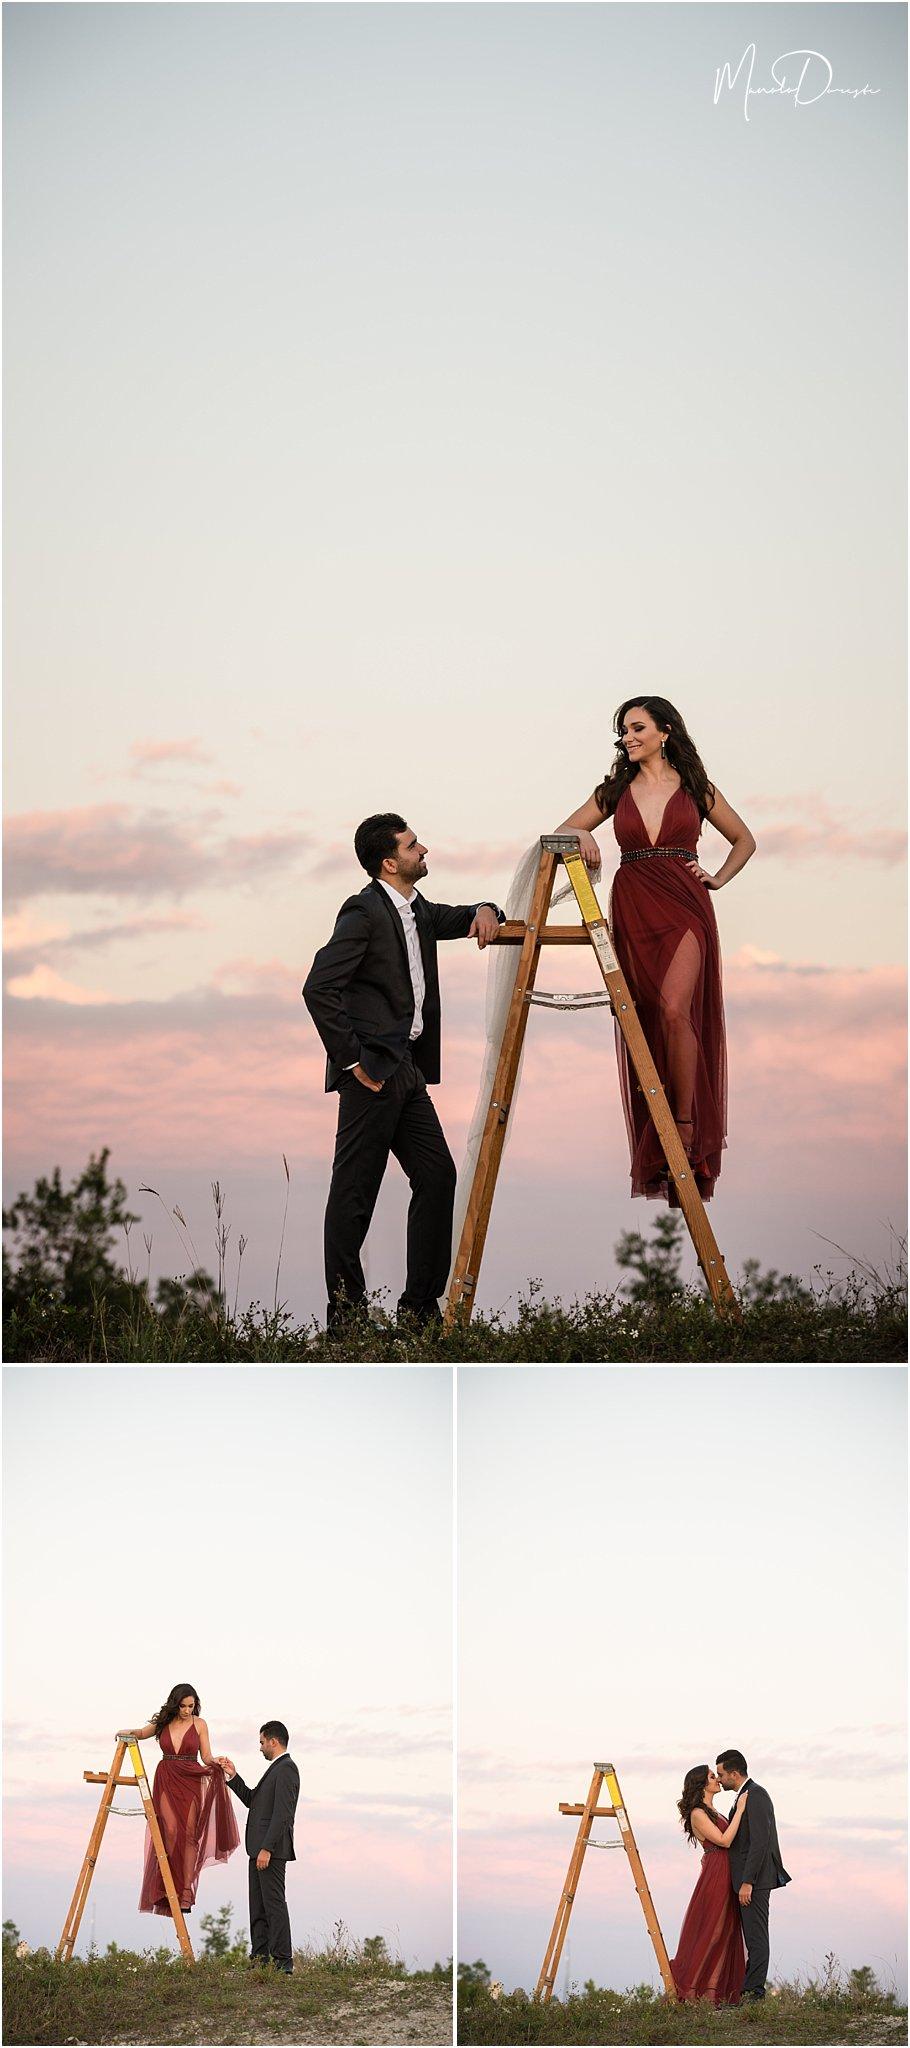 00825_ManoloDoreste_InFocusStudios_Wedding_Family_Photography_Miami_MiamiPhotographer.jpg